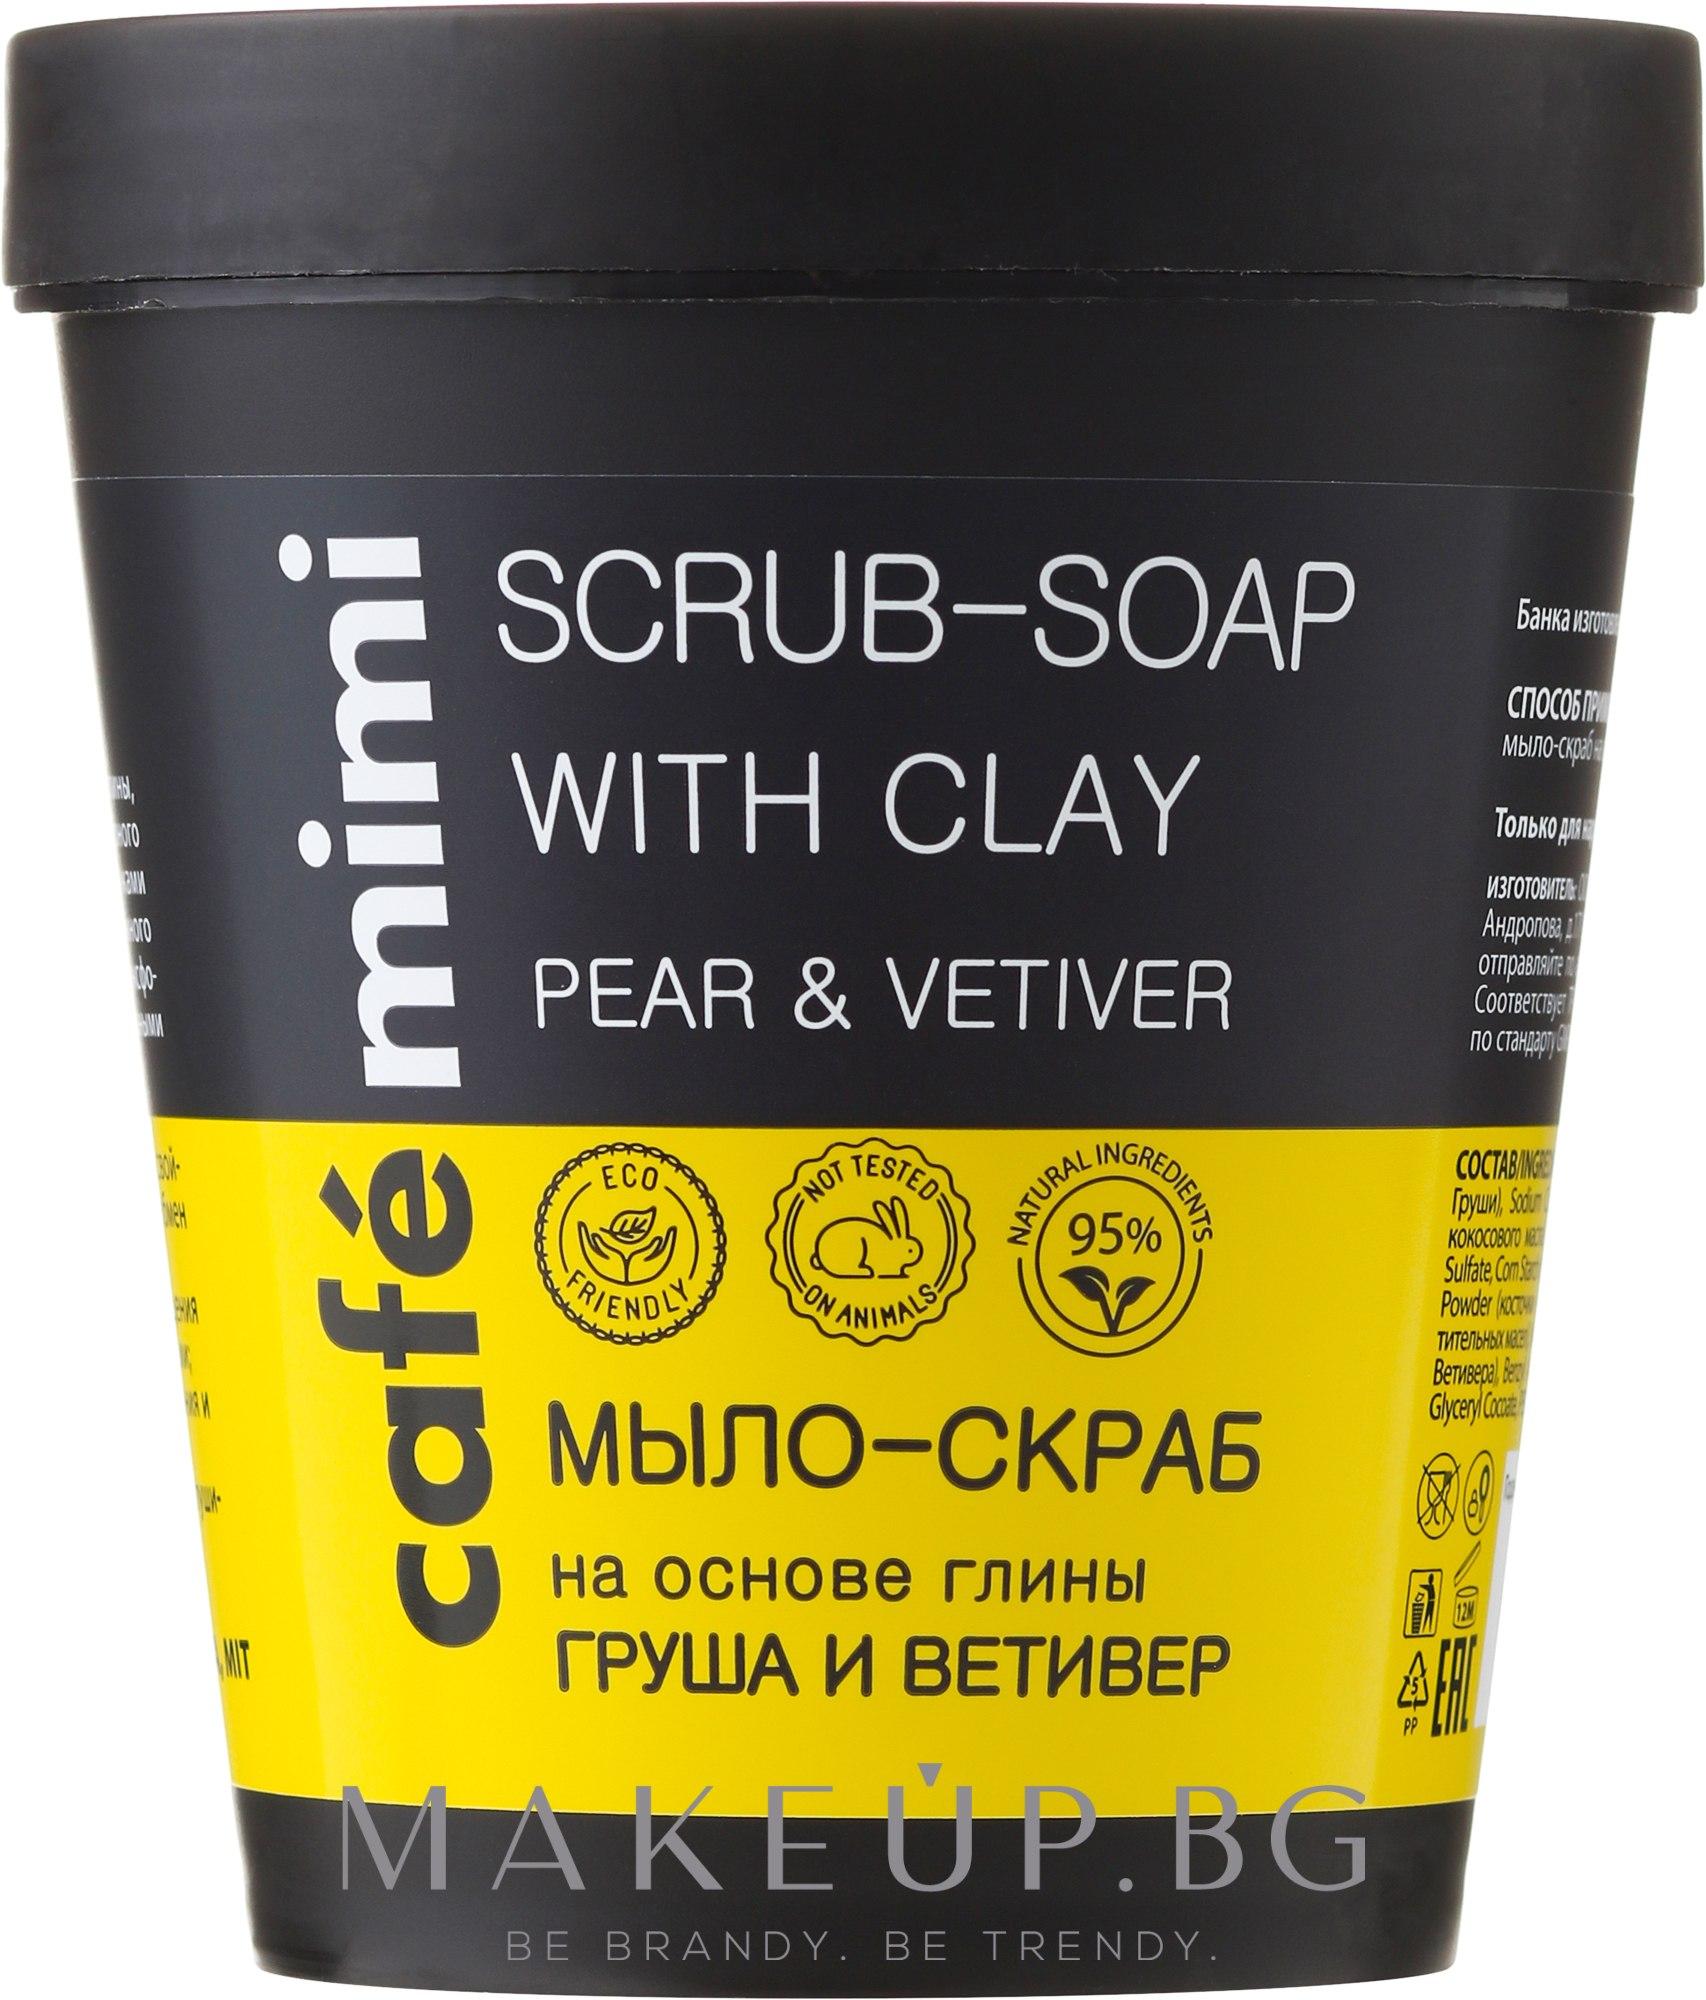 "Сапун-скраб базиран на глина ""Круша и ветивер"" - Cafe Mimi Scrub-Soap With Clay Pear & Vetiver — снимка 220 ml"